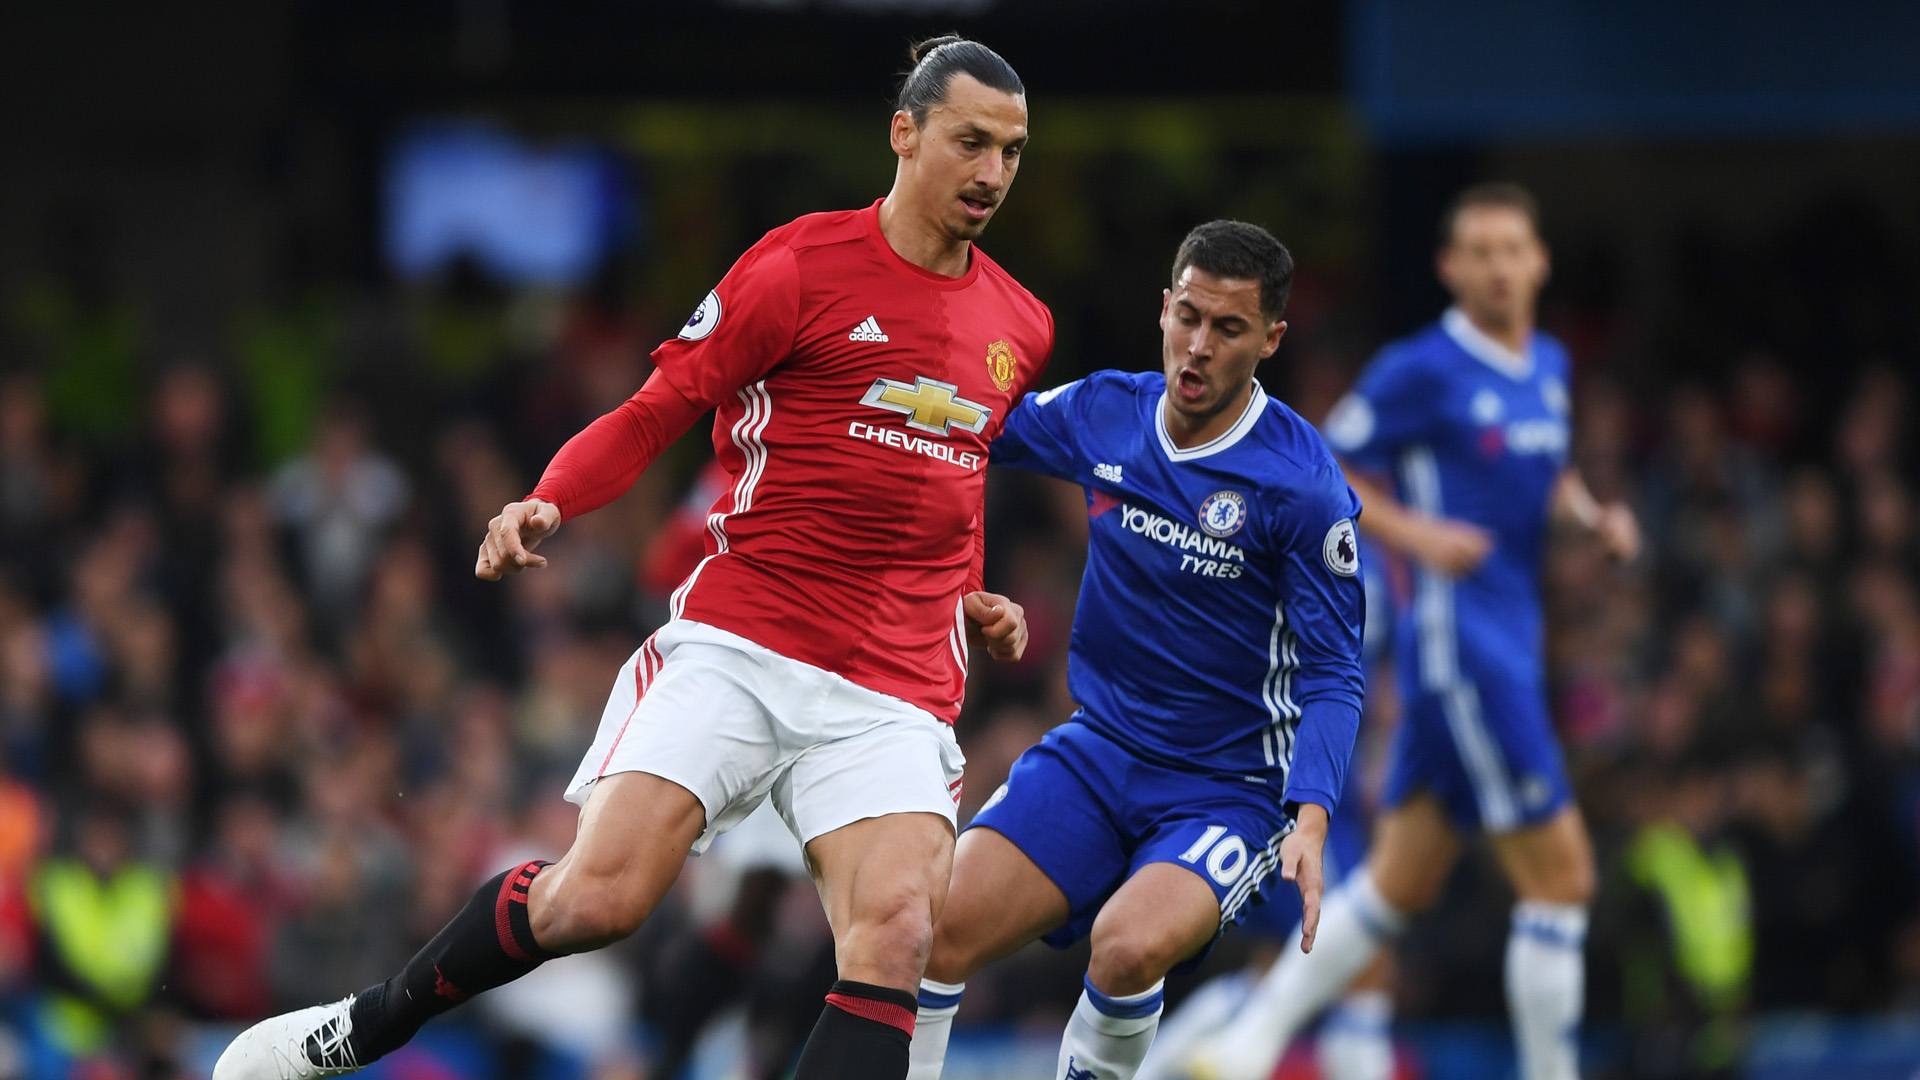 Ibrahimovic Hazard Manchester United Chelsea Premier League 2016